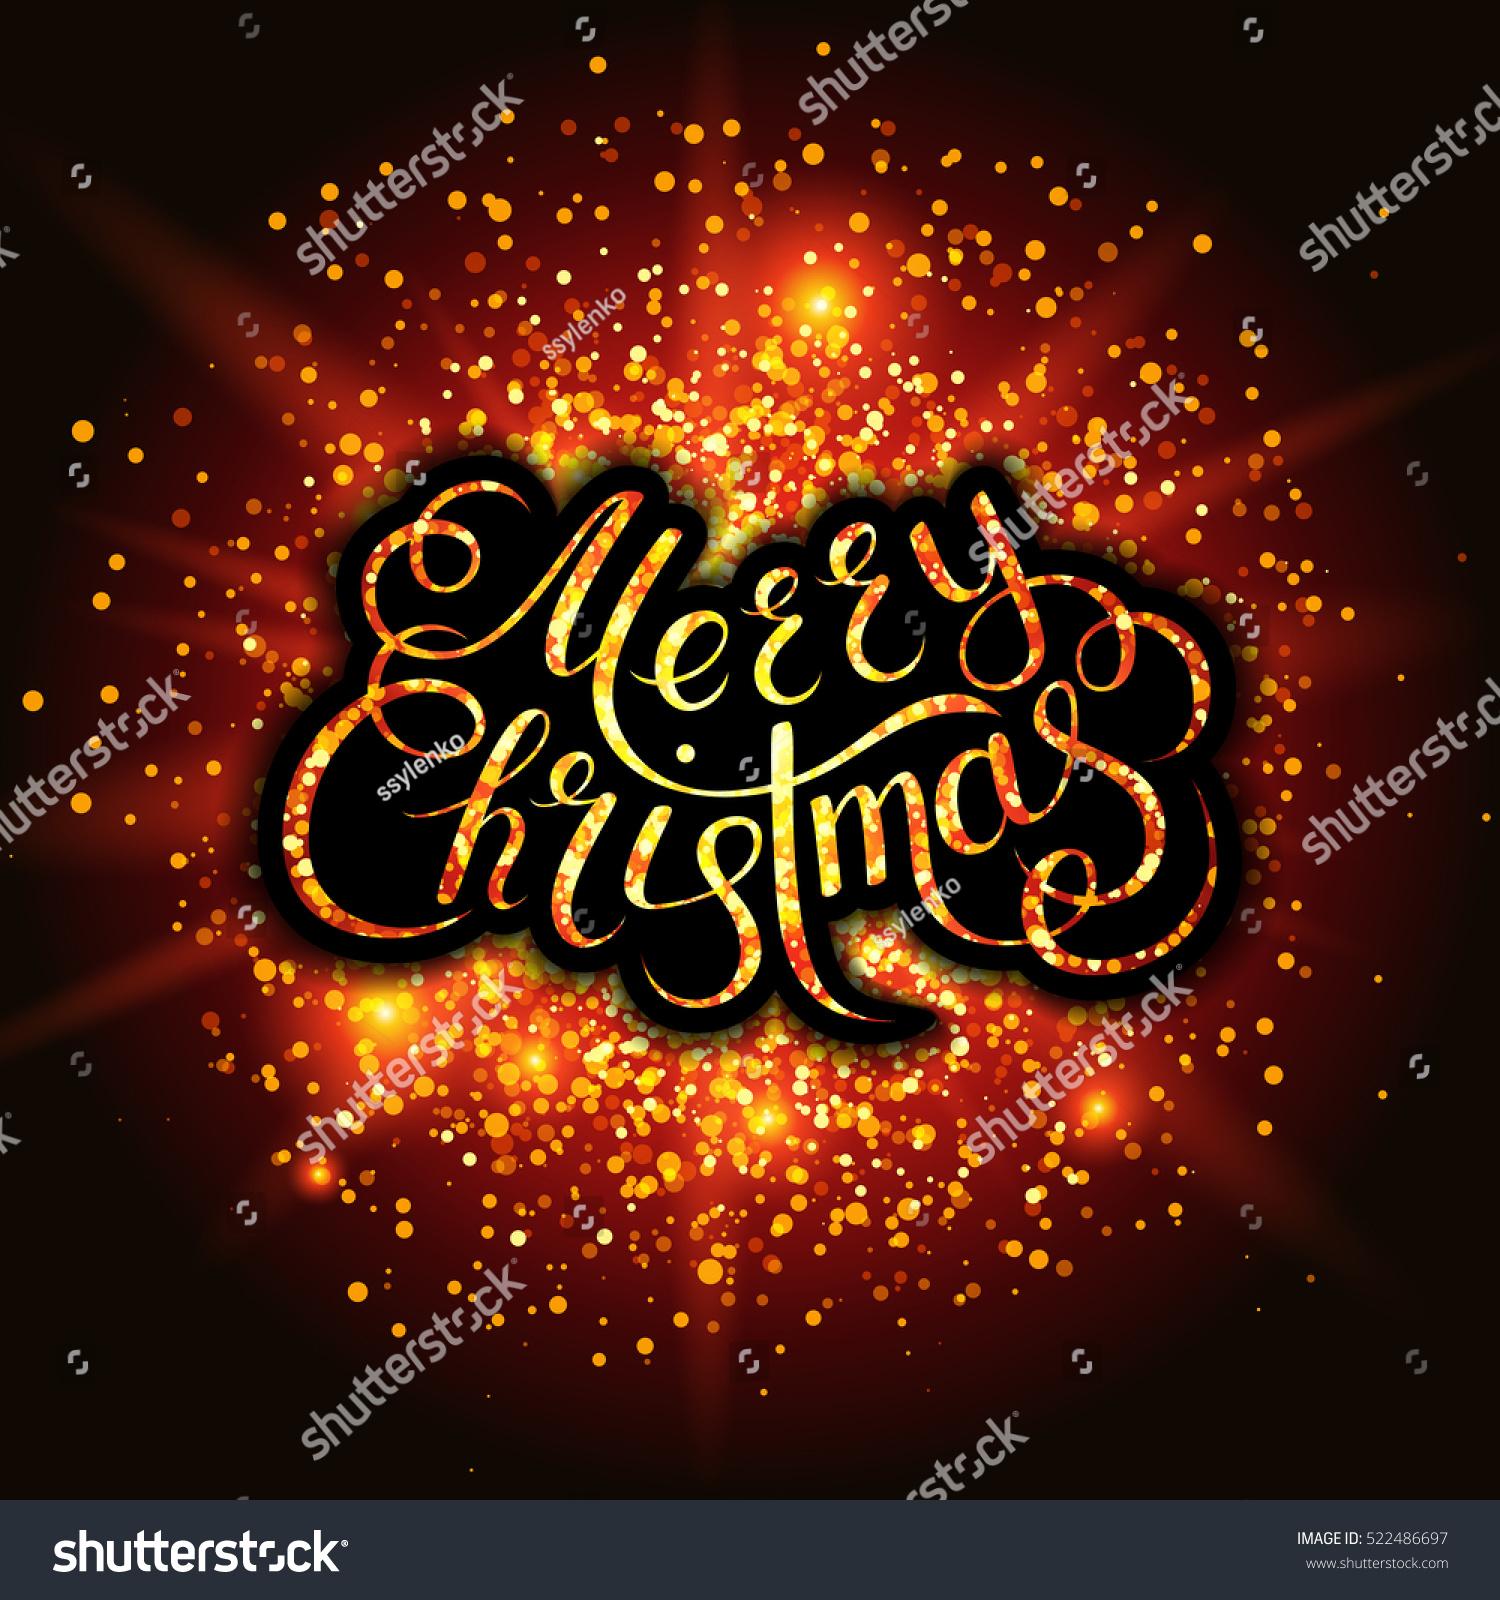 Merry Christmas Snowflakes Fireworks Effect Handwritten Stock ...